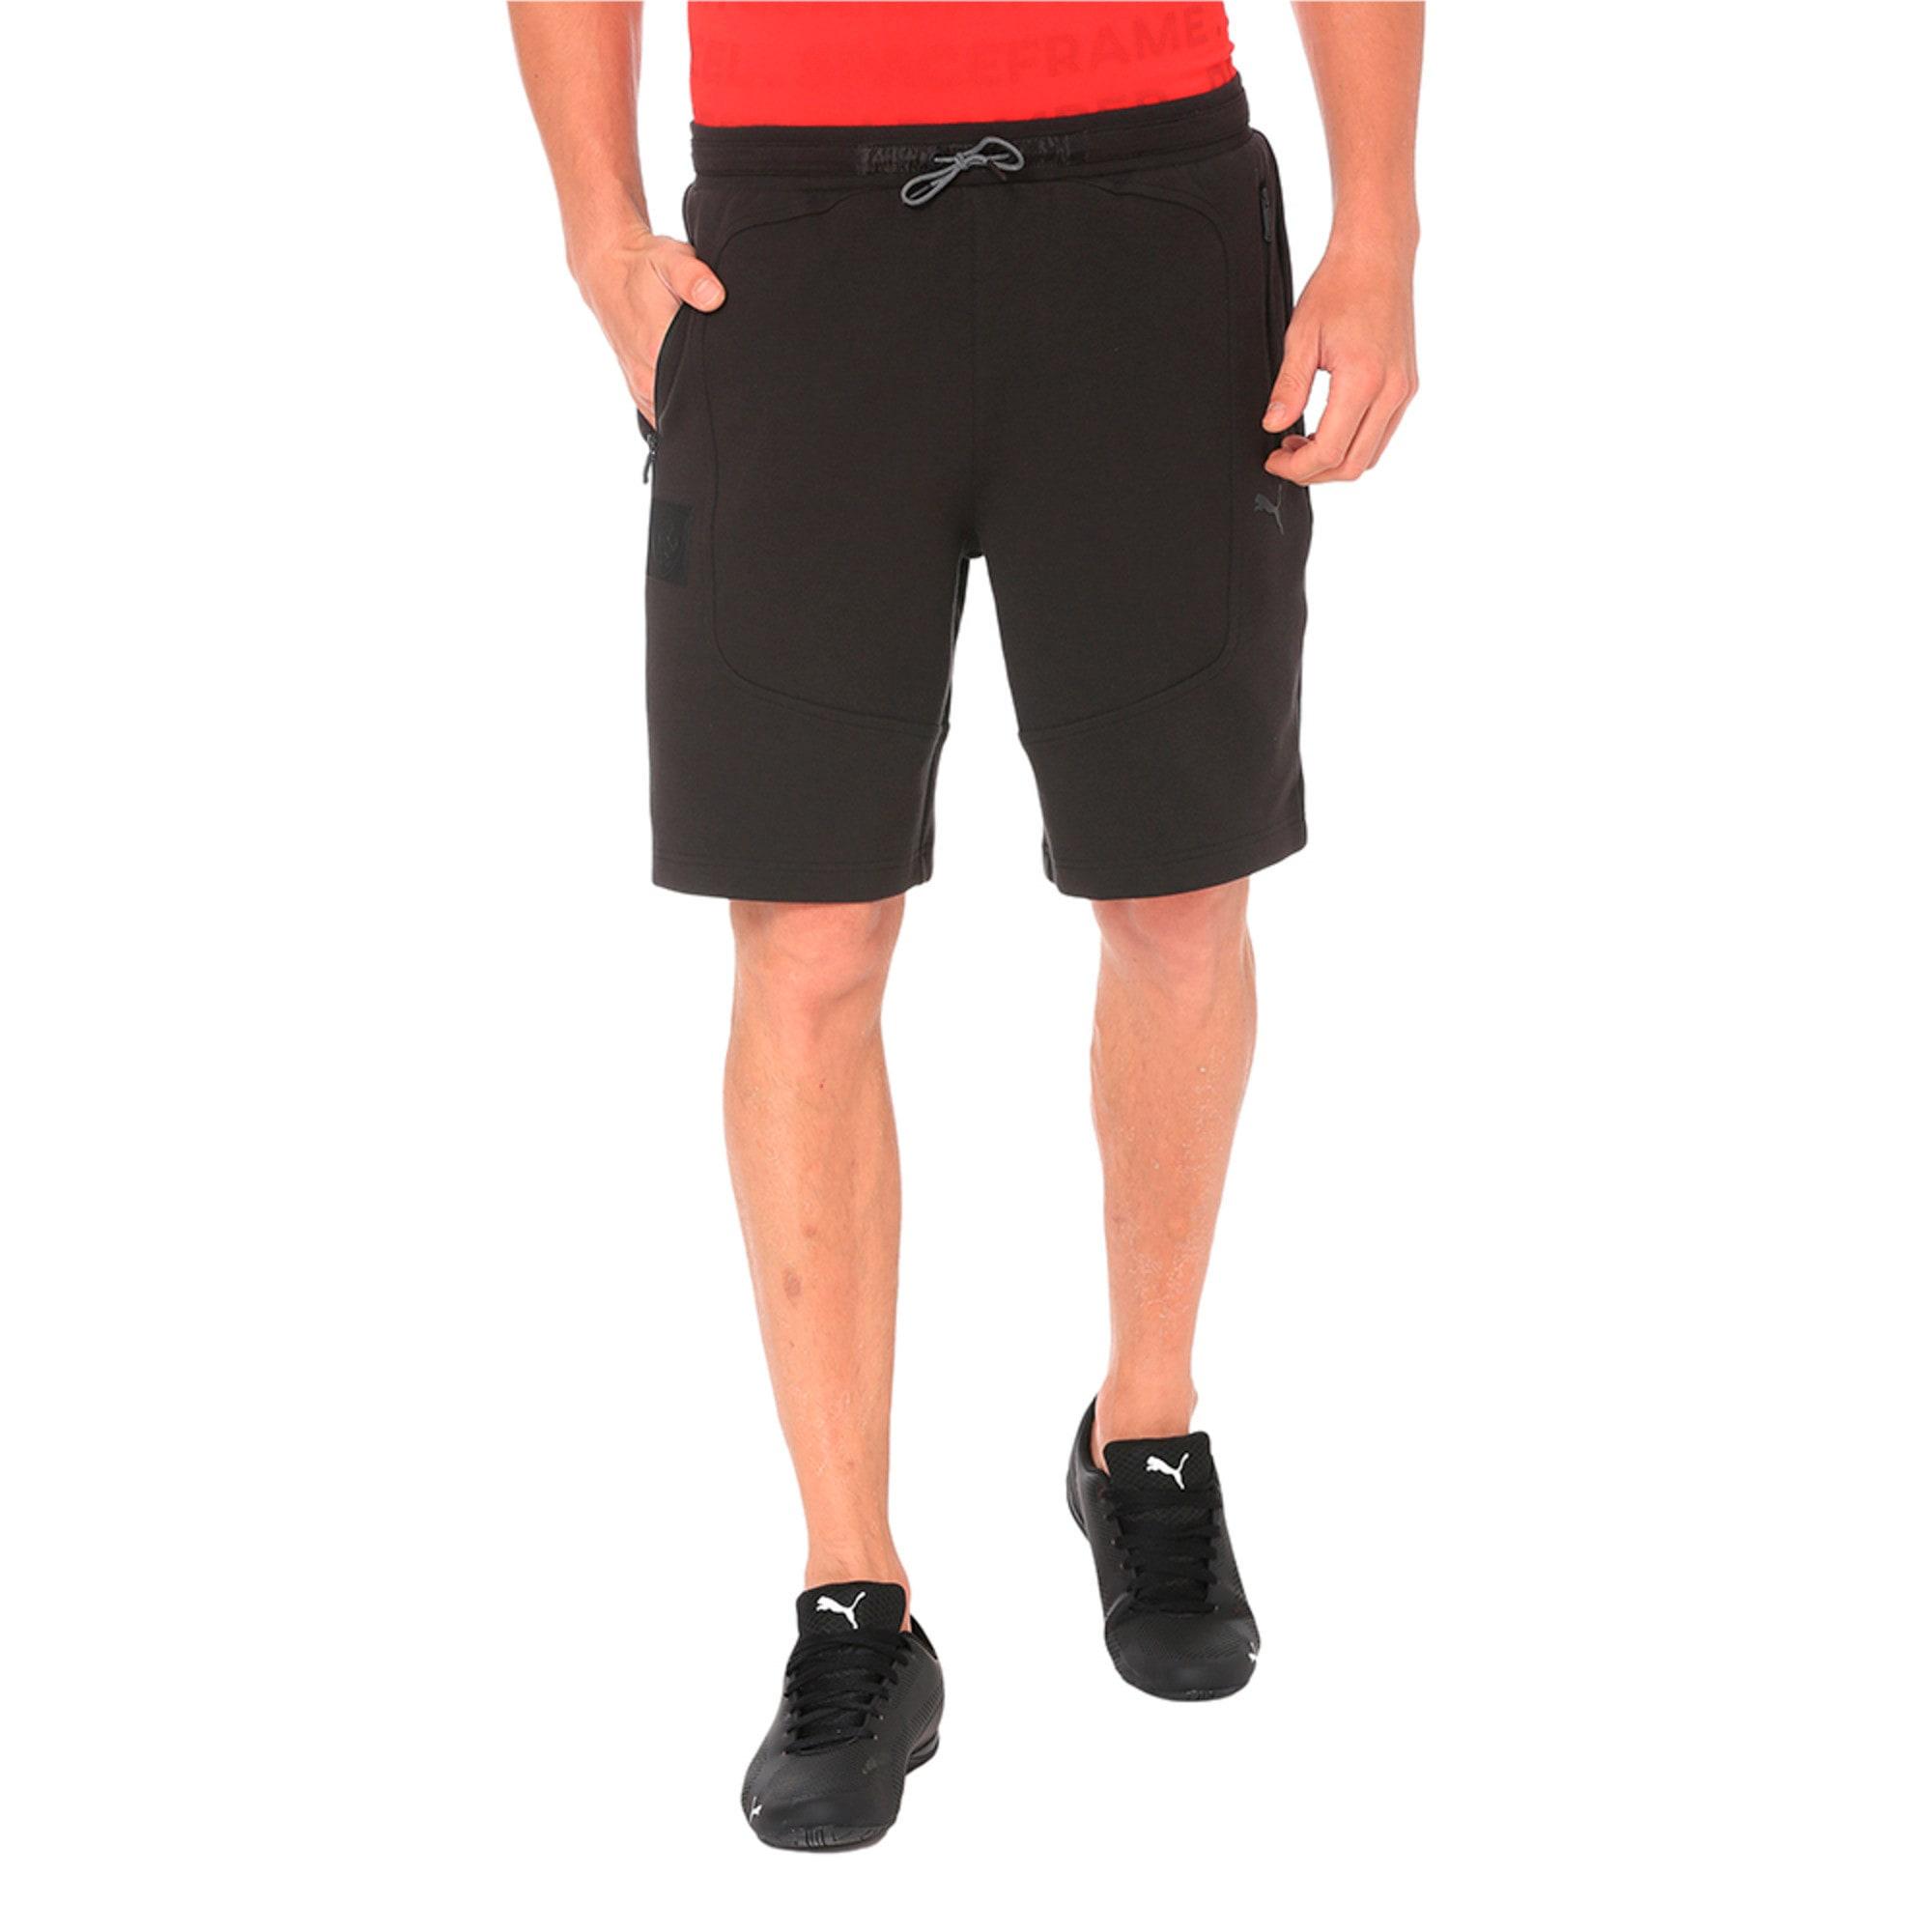 Thumbnail 1 of Ferrari Knitted Men's Shorts, Puma Black, medium-IND